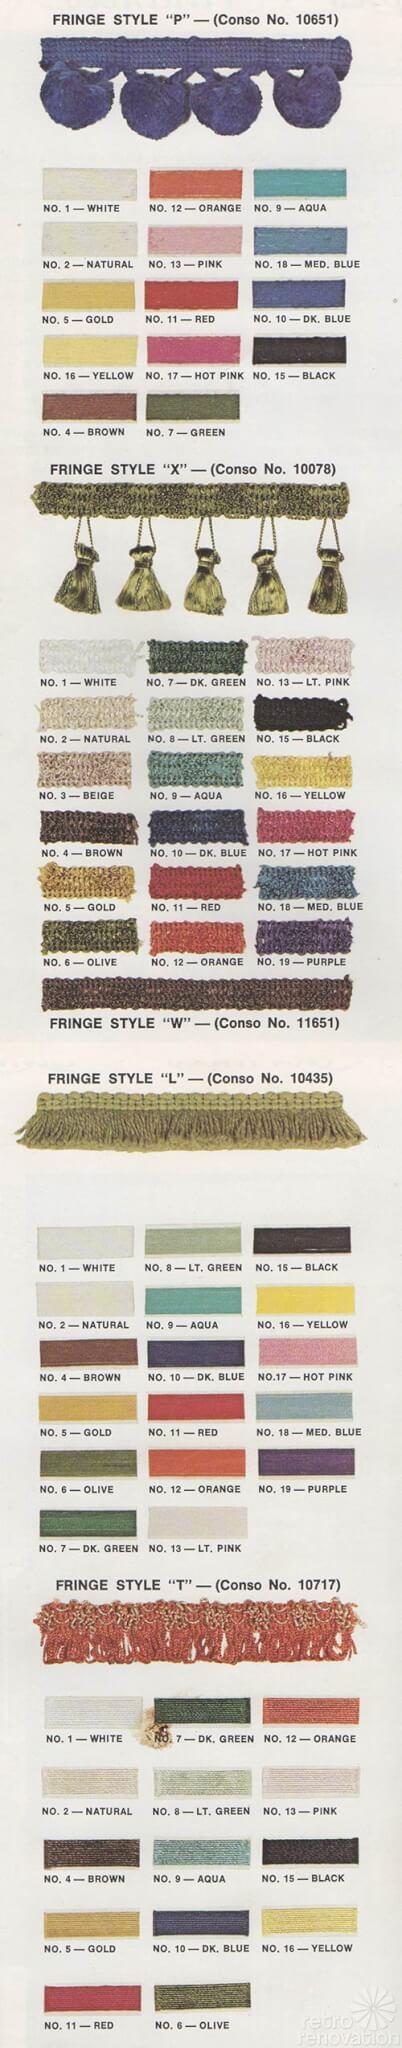 vintage trim